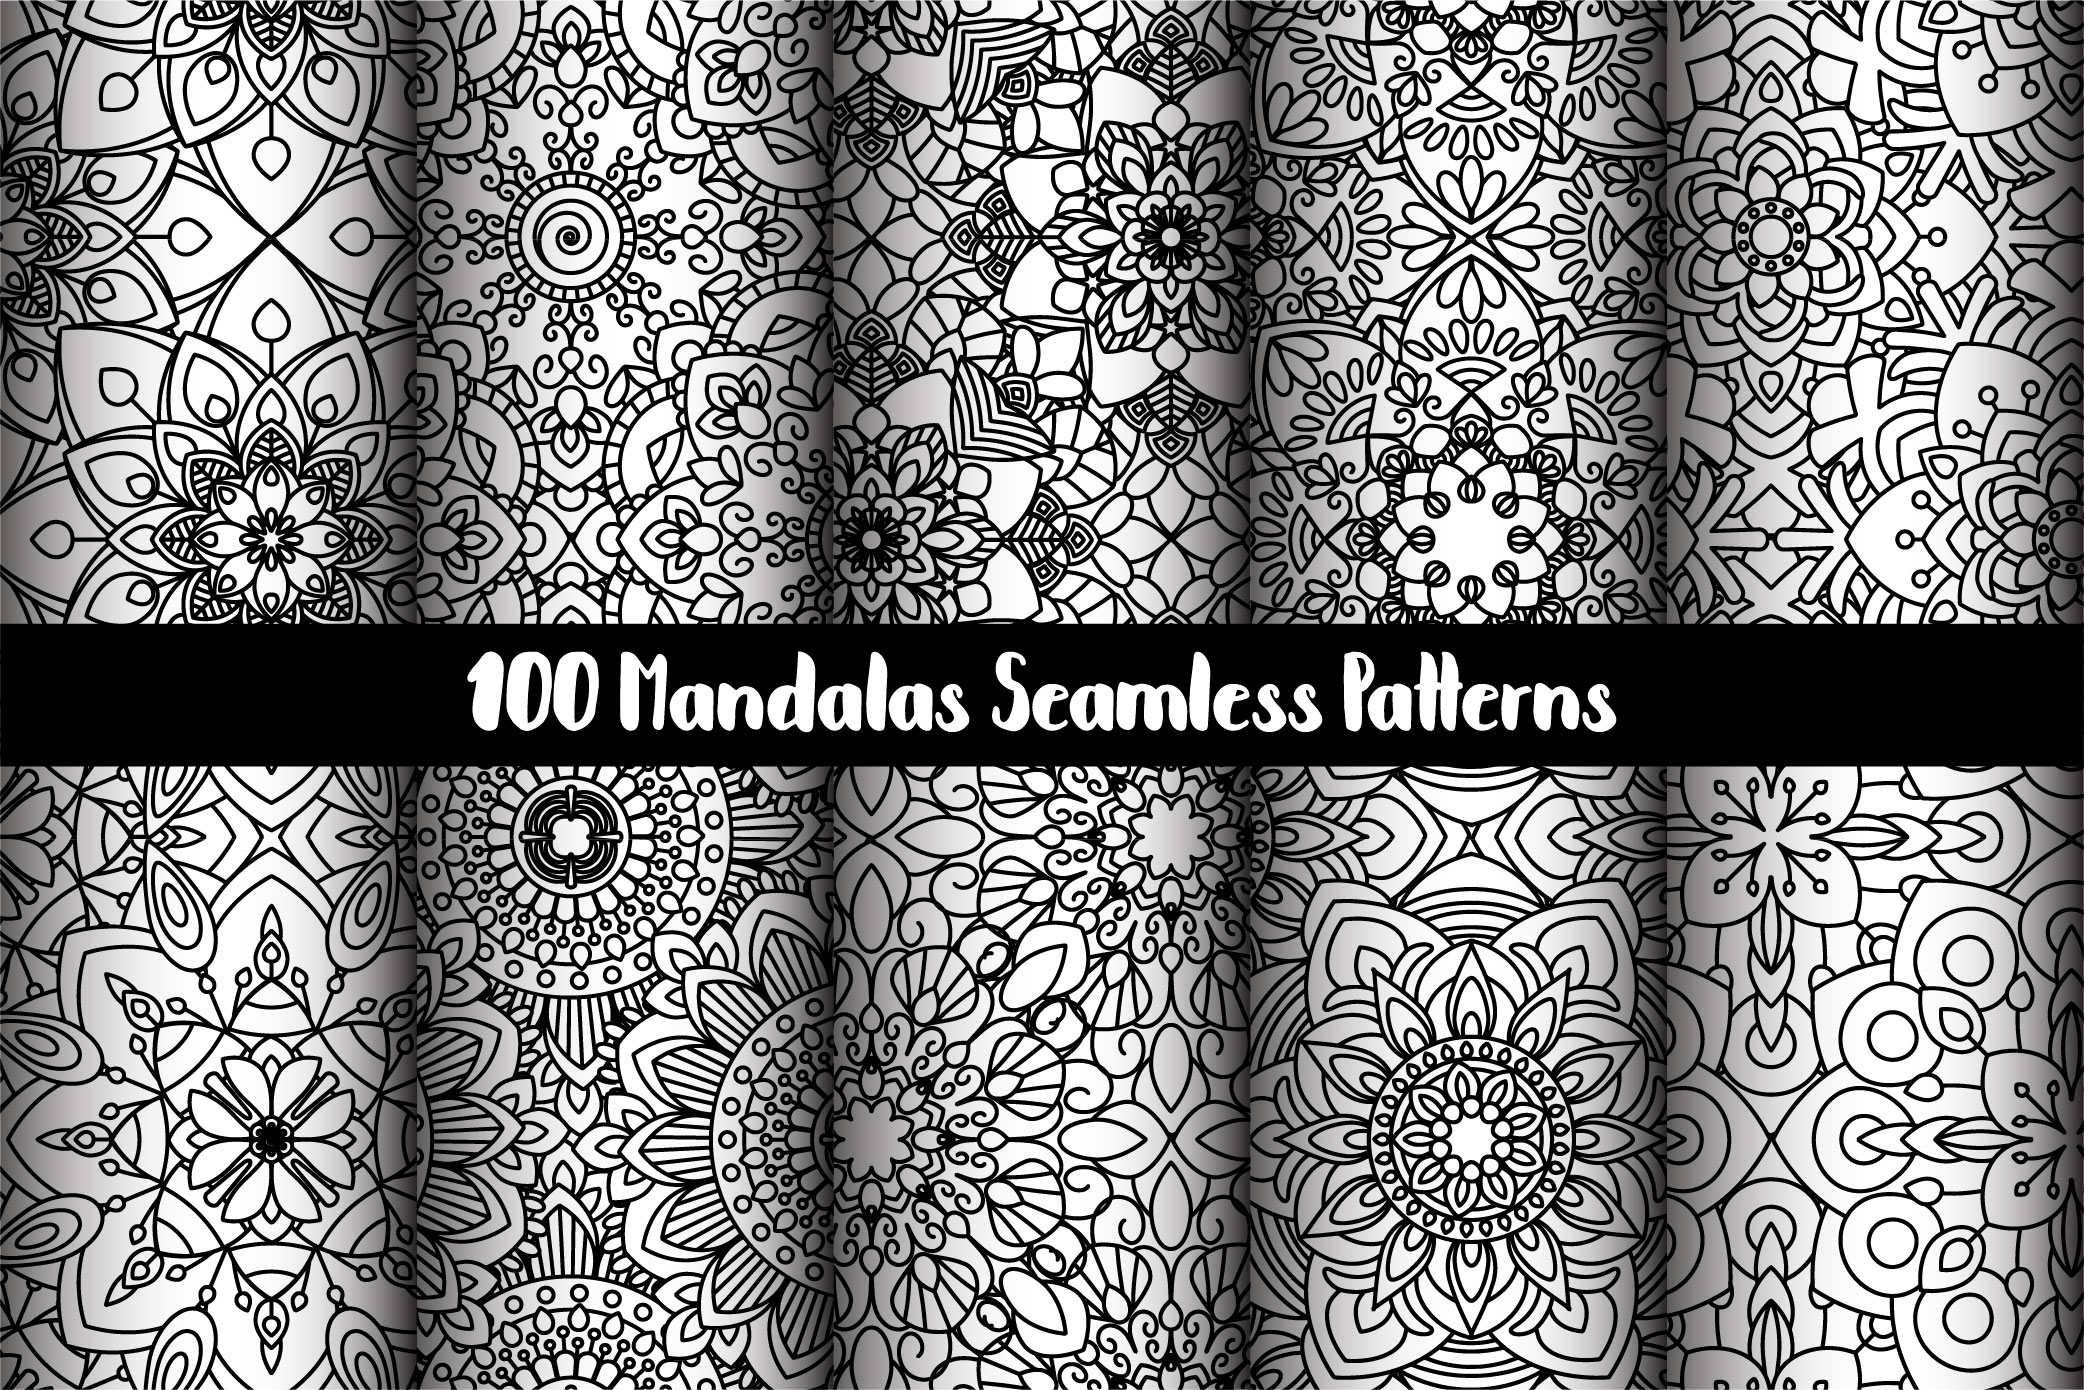 100 Mandalas Seamless Patterns example image 16